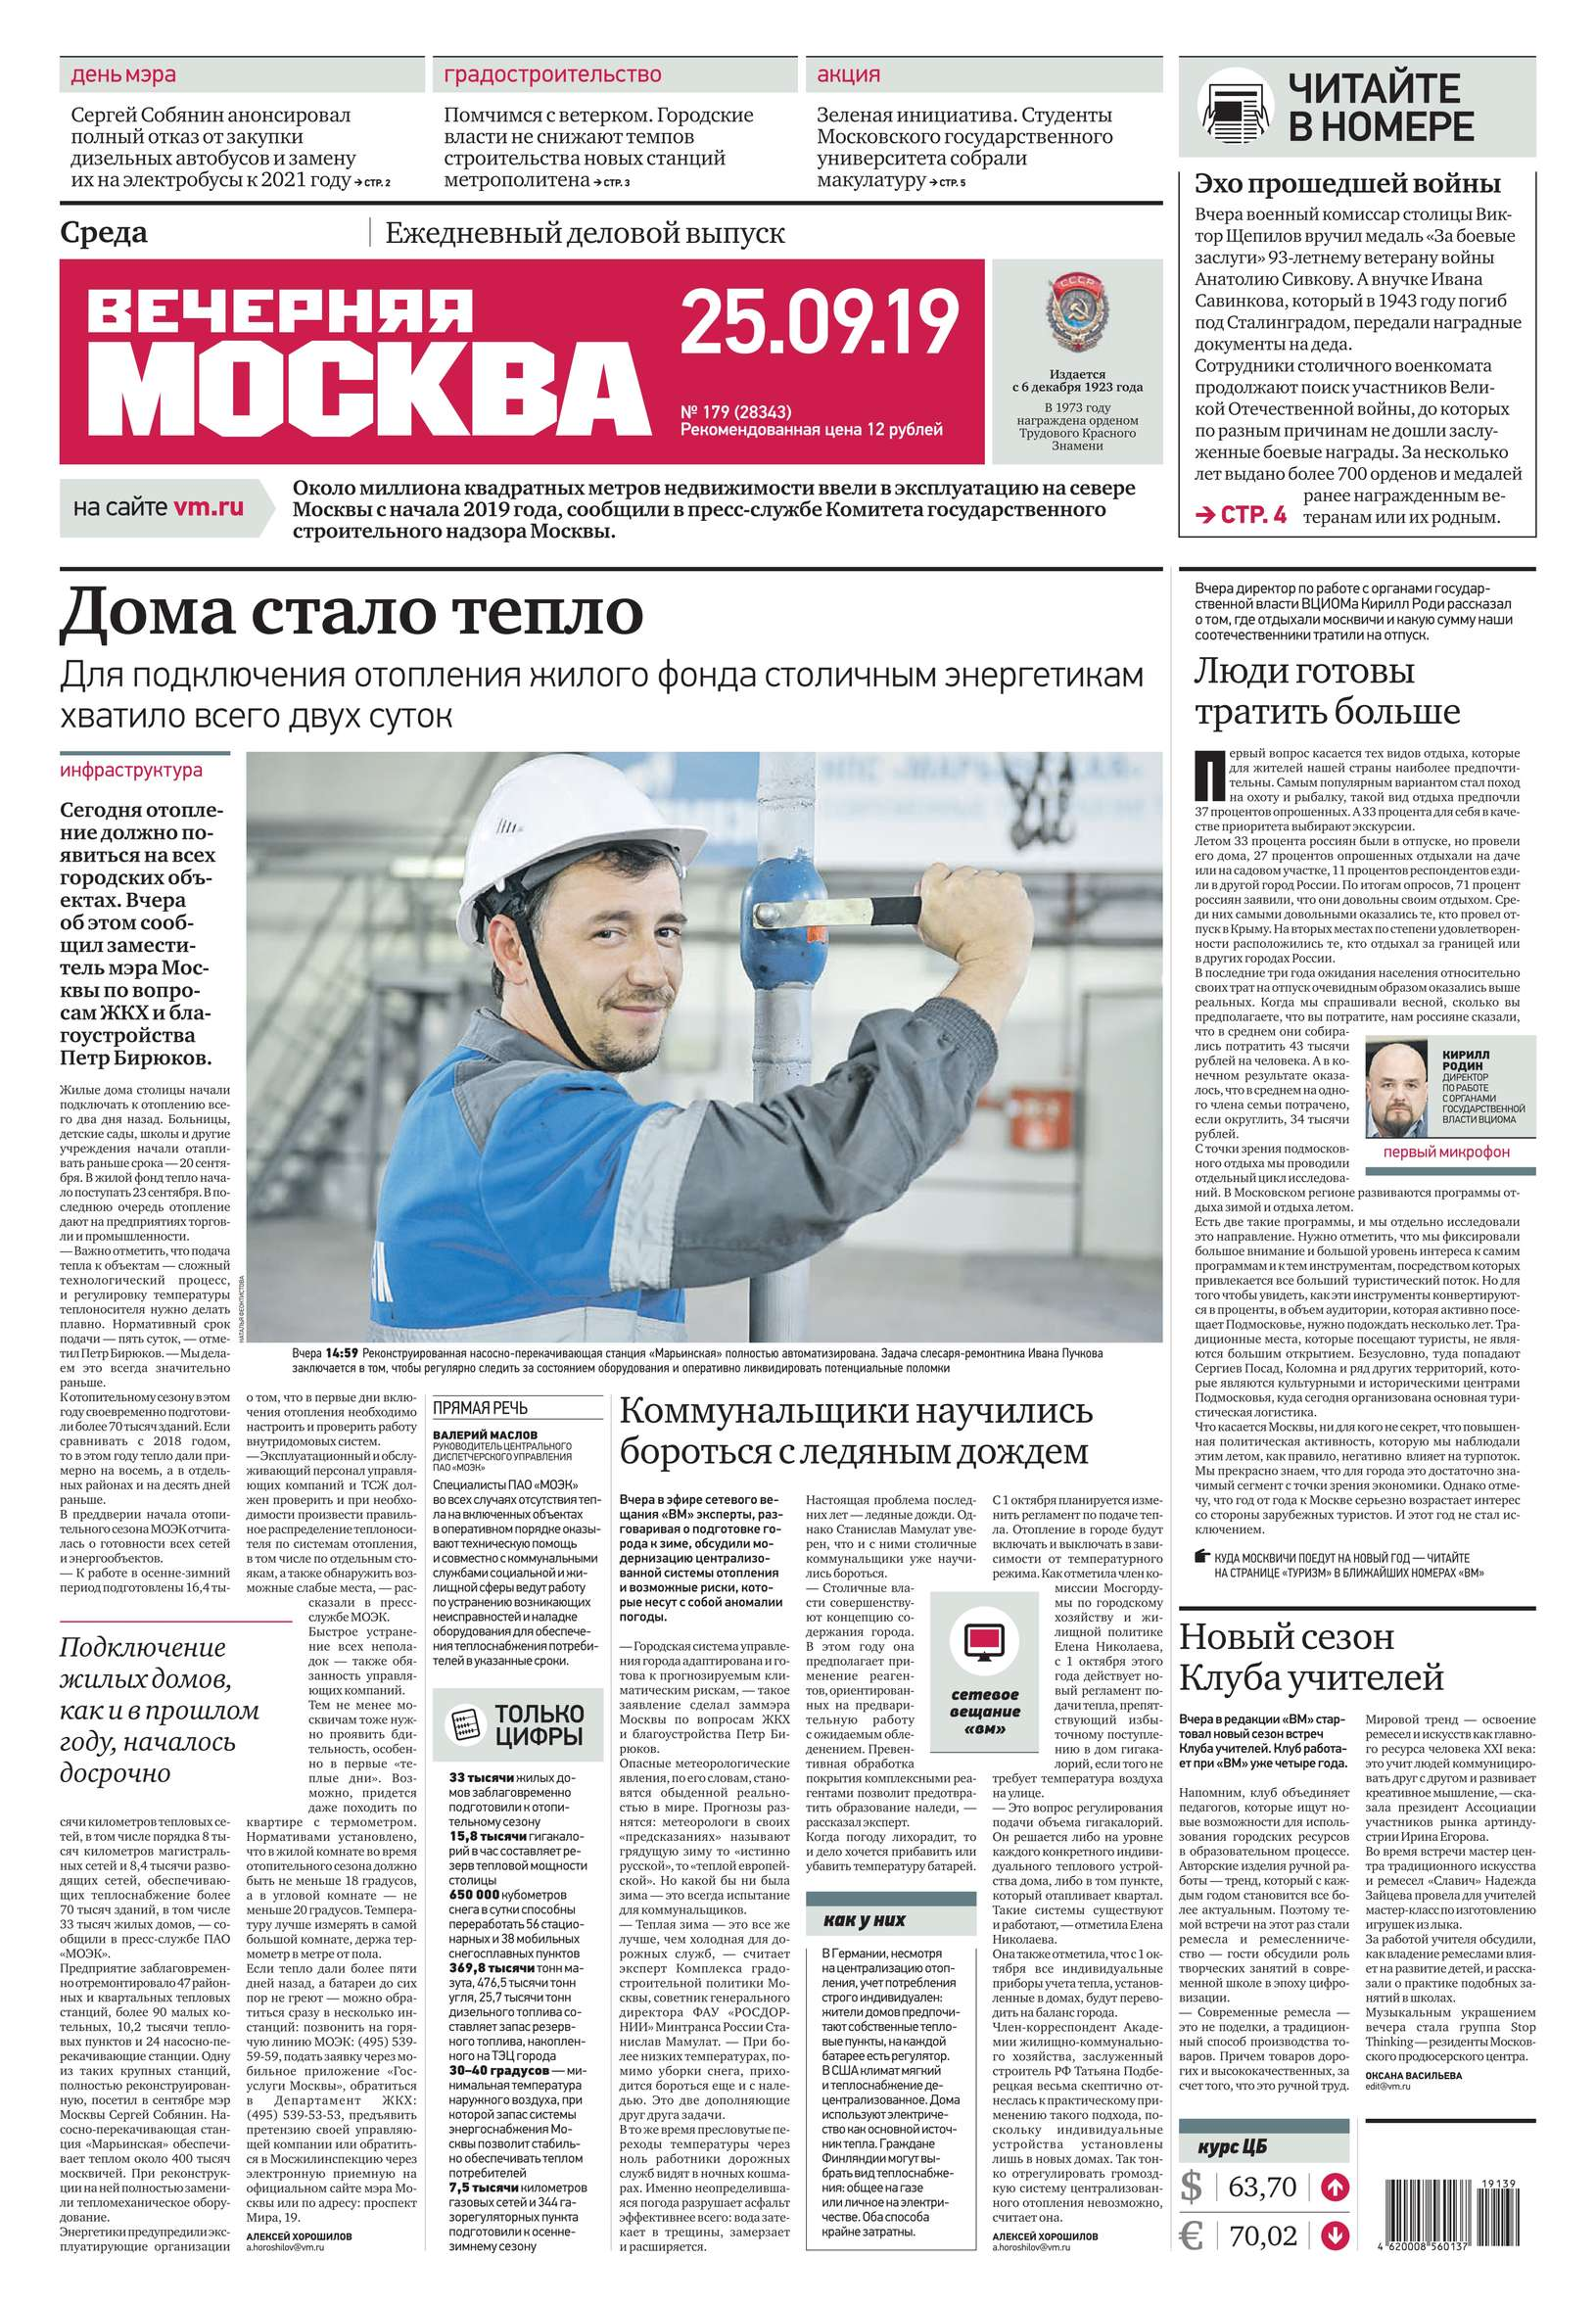 Редакция газеты Вечерняя Москва Вечерняя Москва 179-2019